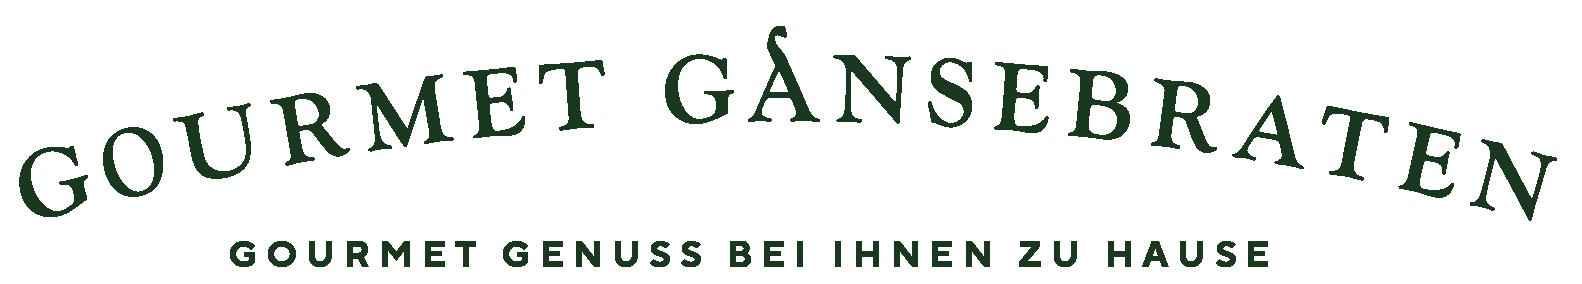 Shop für Gänsebraten & Entenbraten | Gourmetgänsebraten